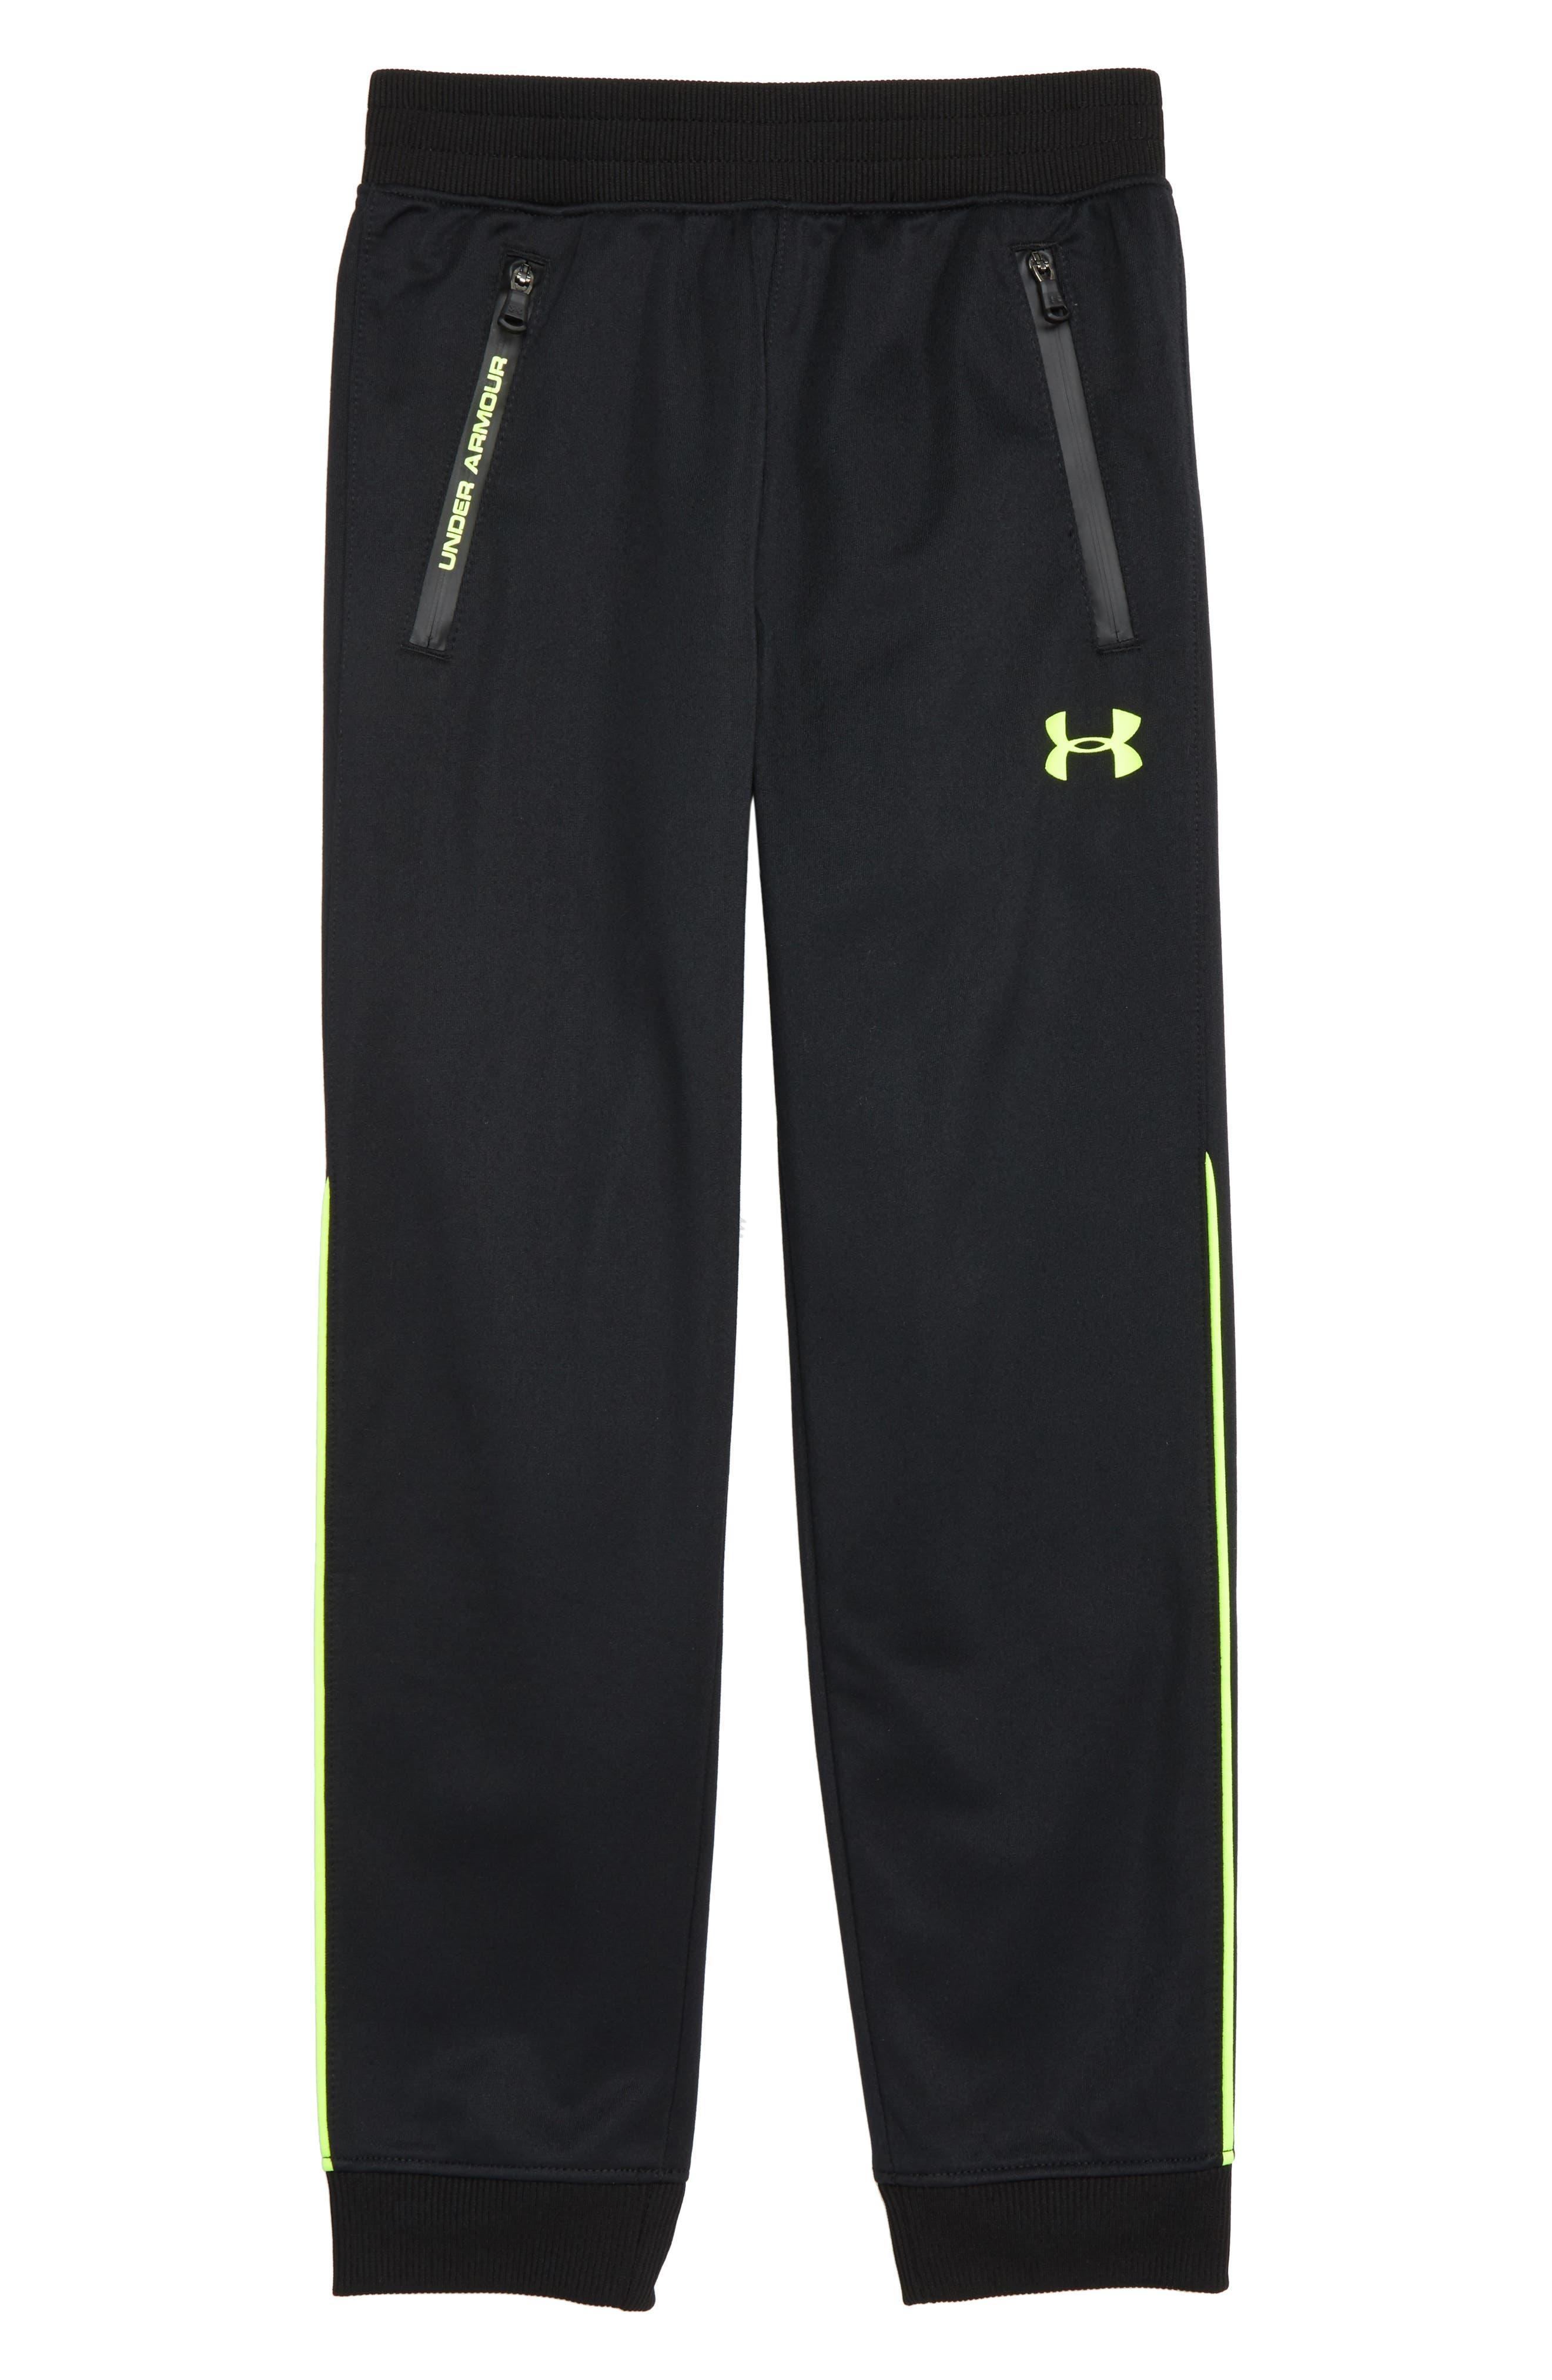 Pennant 2.0 Pants,                         Main,                         color, BLACK